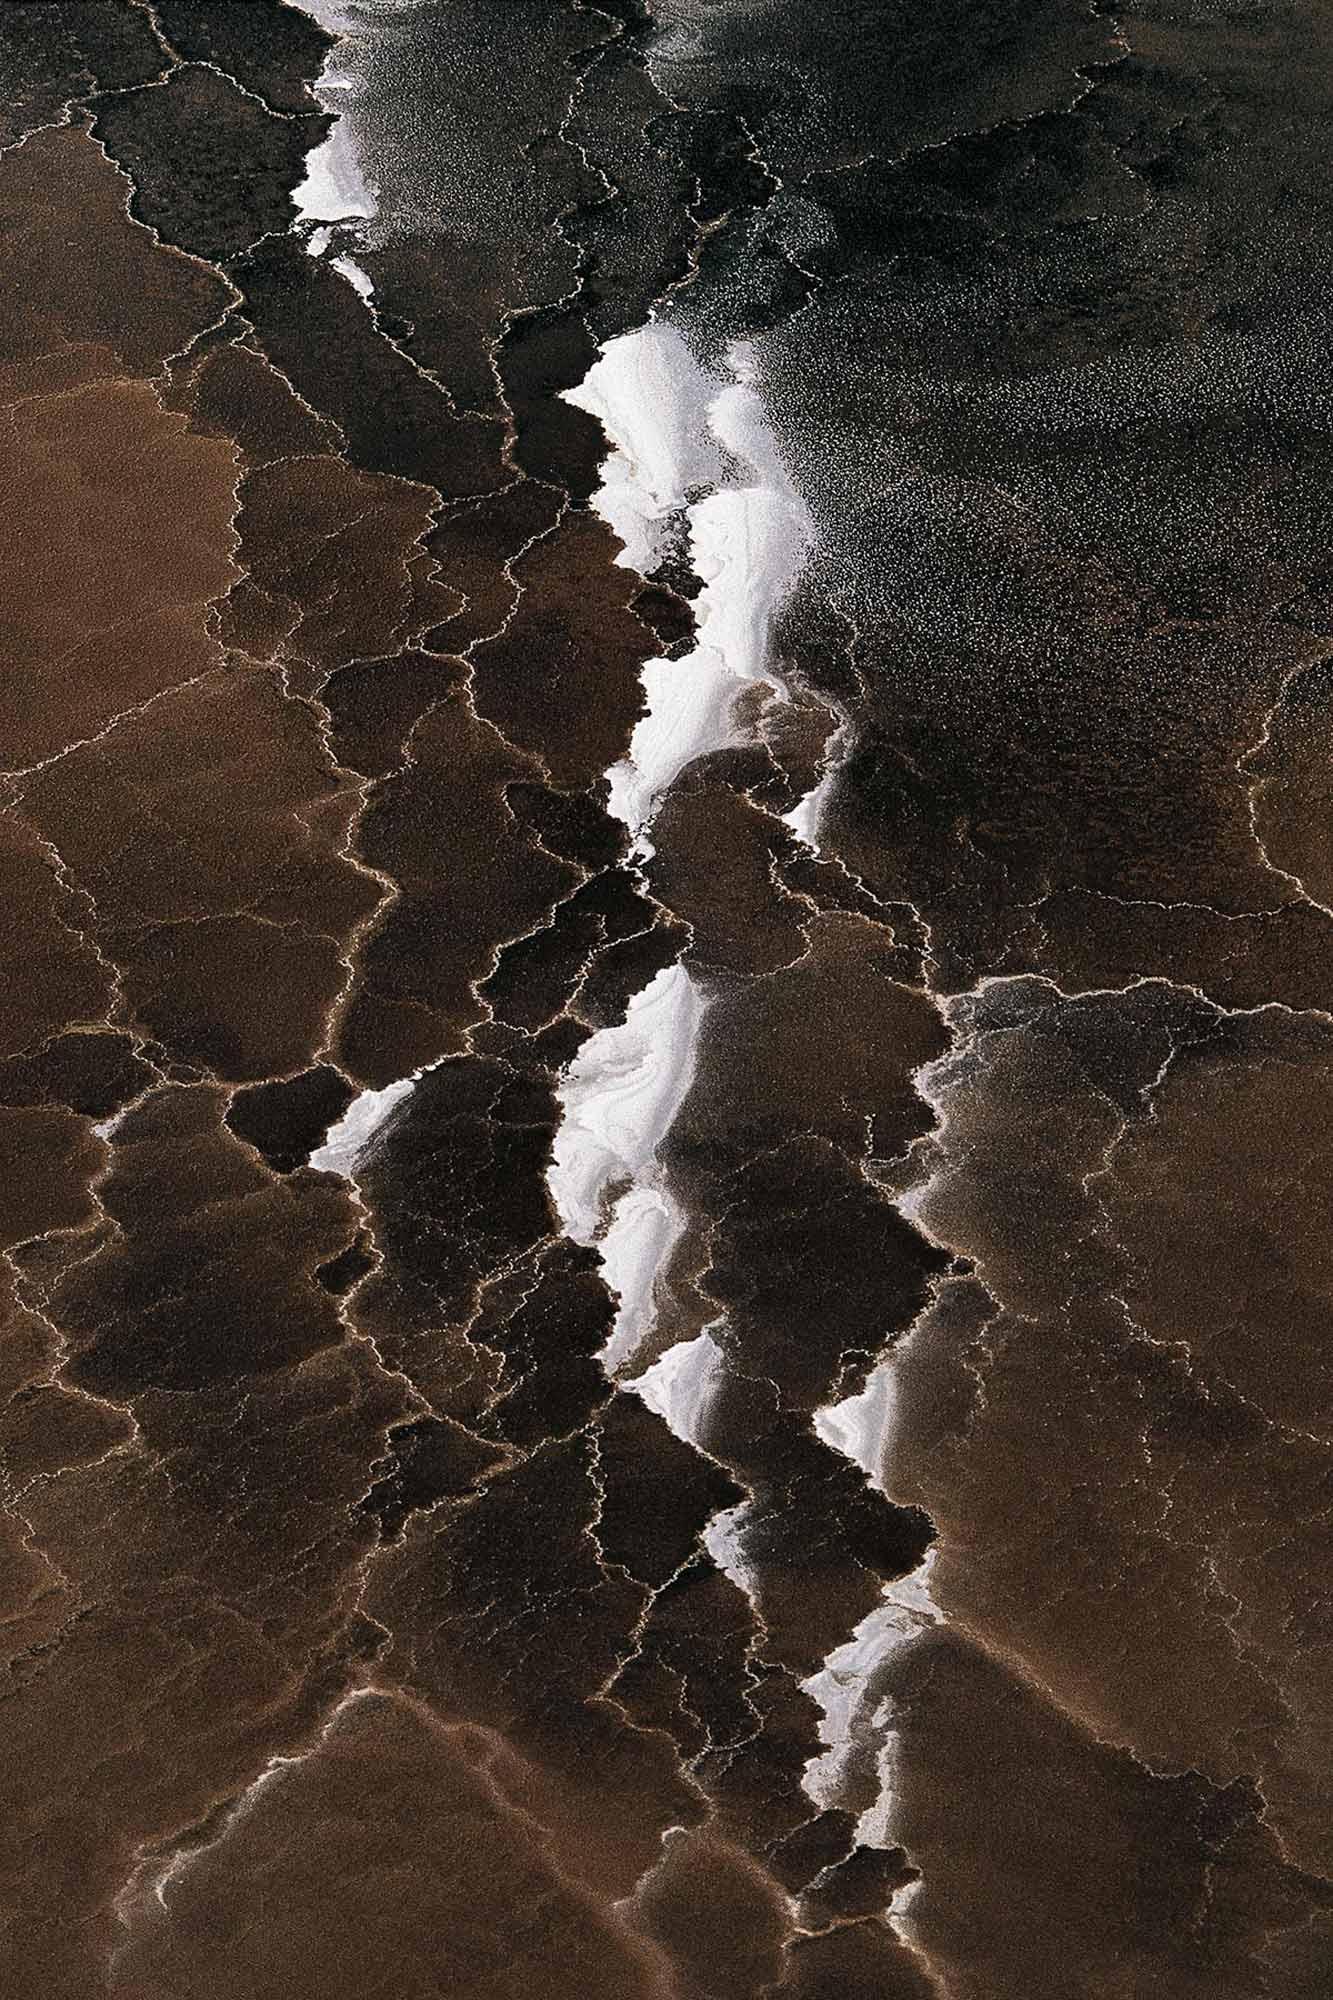 Chott Mérouane - Yann Arthus-Bertrand